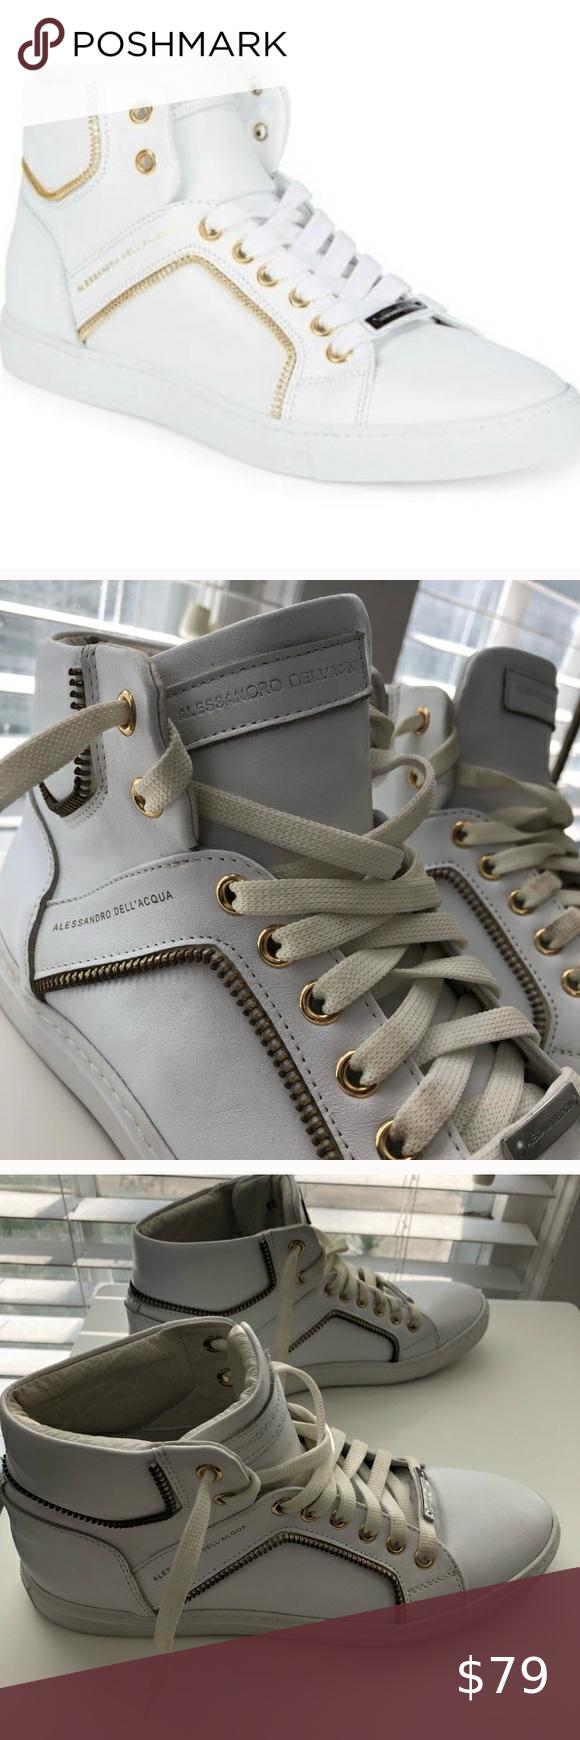 Alessandro DellAcqua White High Top Sneakers with Gold